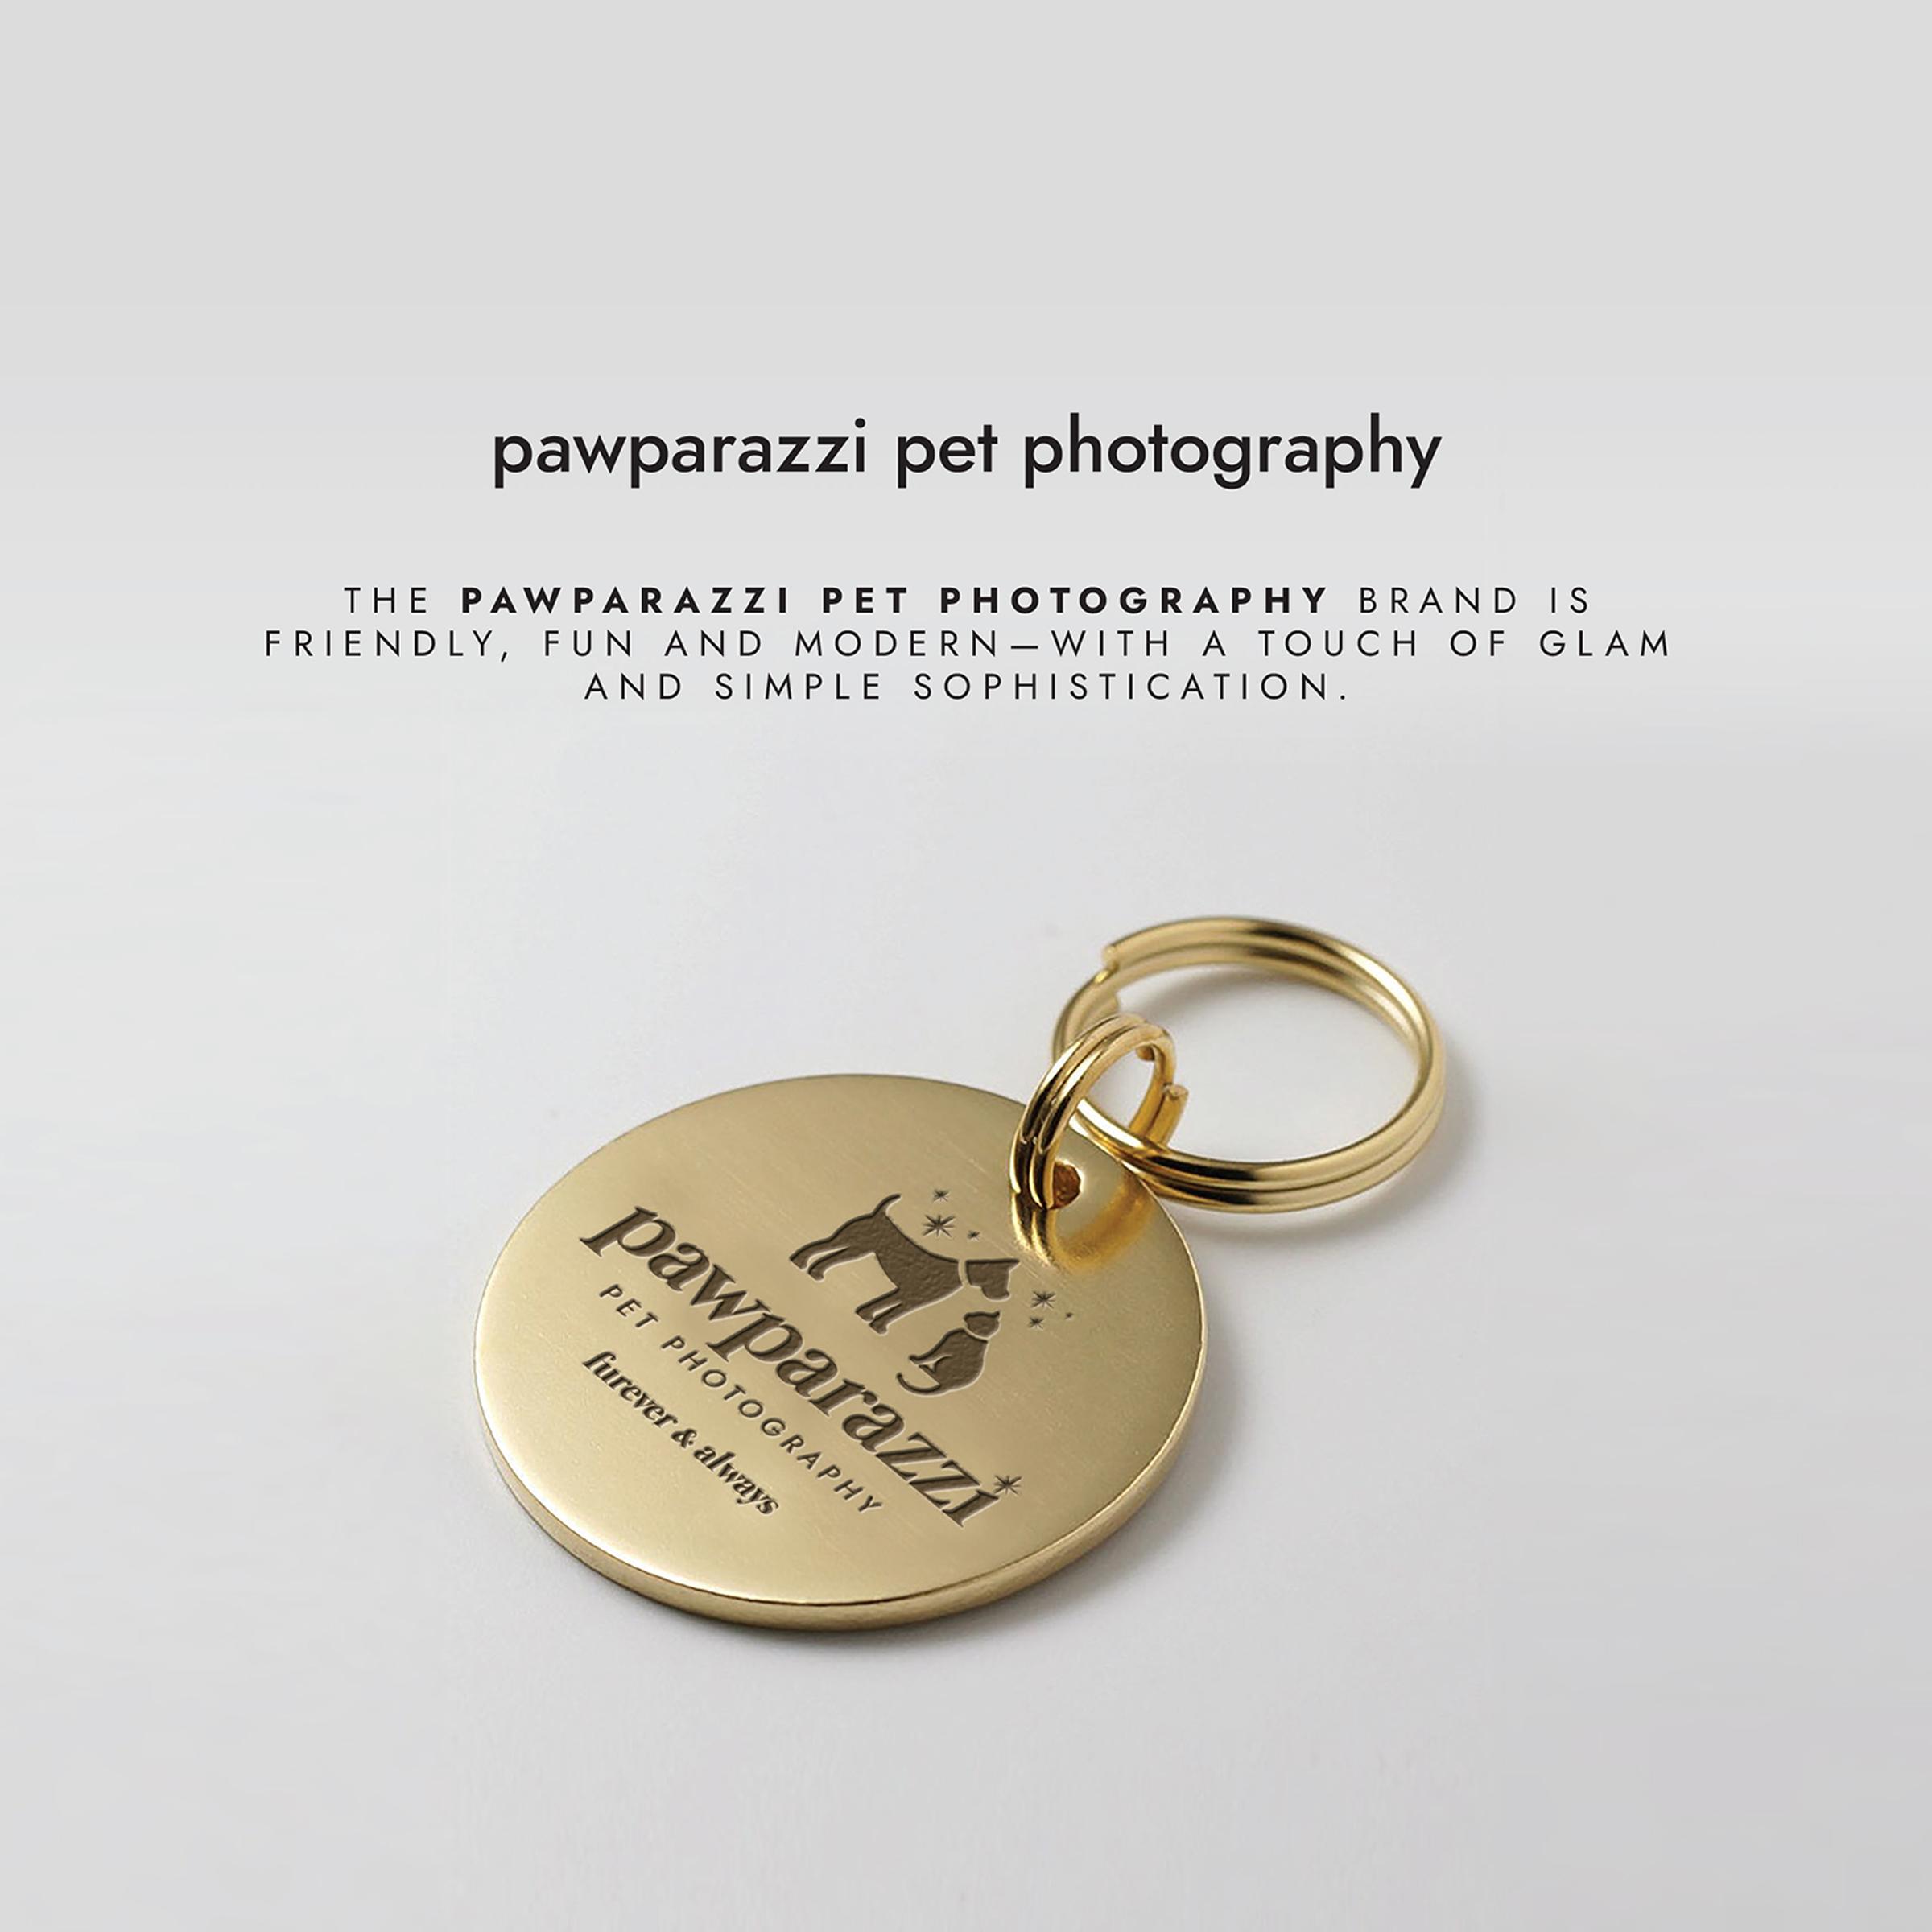 Pawparazzi Winnipeg Feminist Brands Website Design Feminist Entrepreneurs Brand Presentation BrandCharacteristics